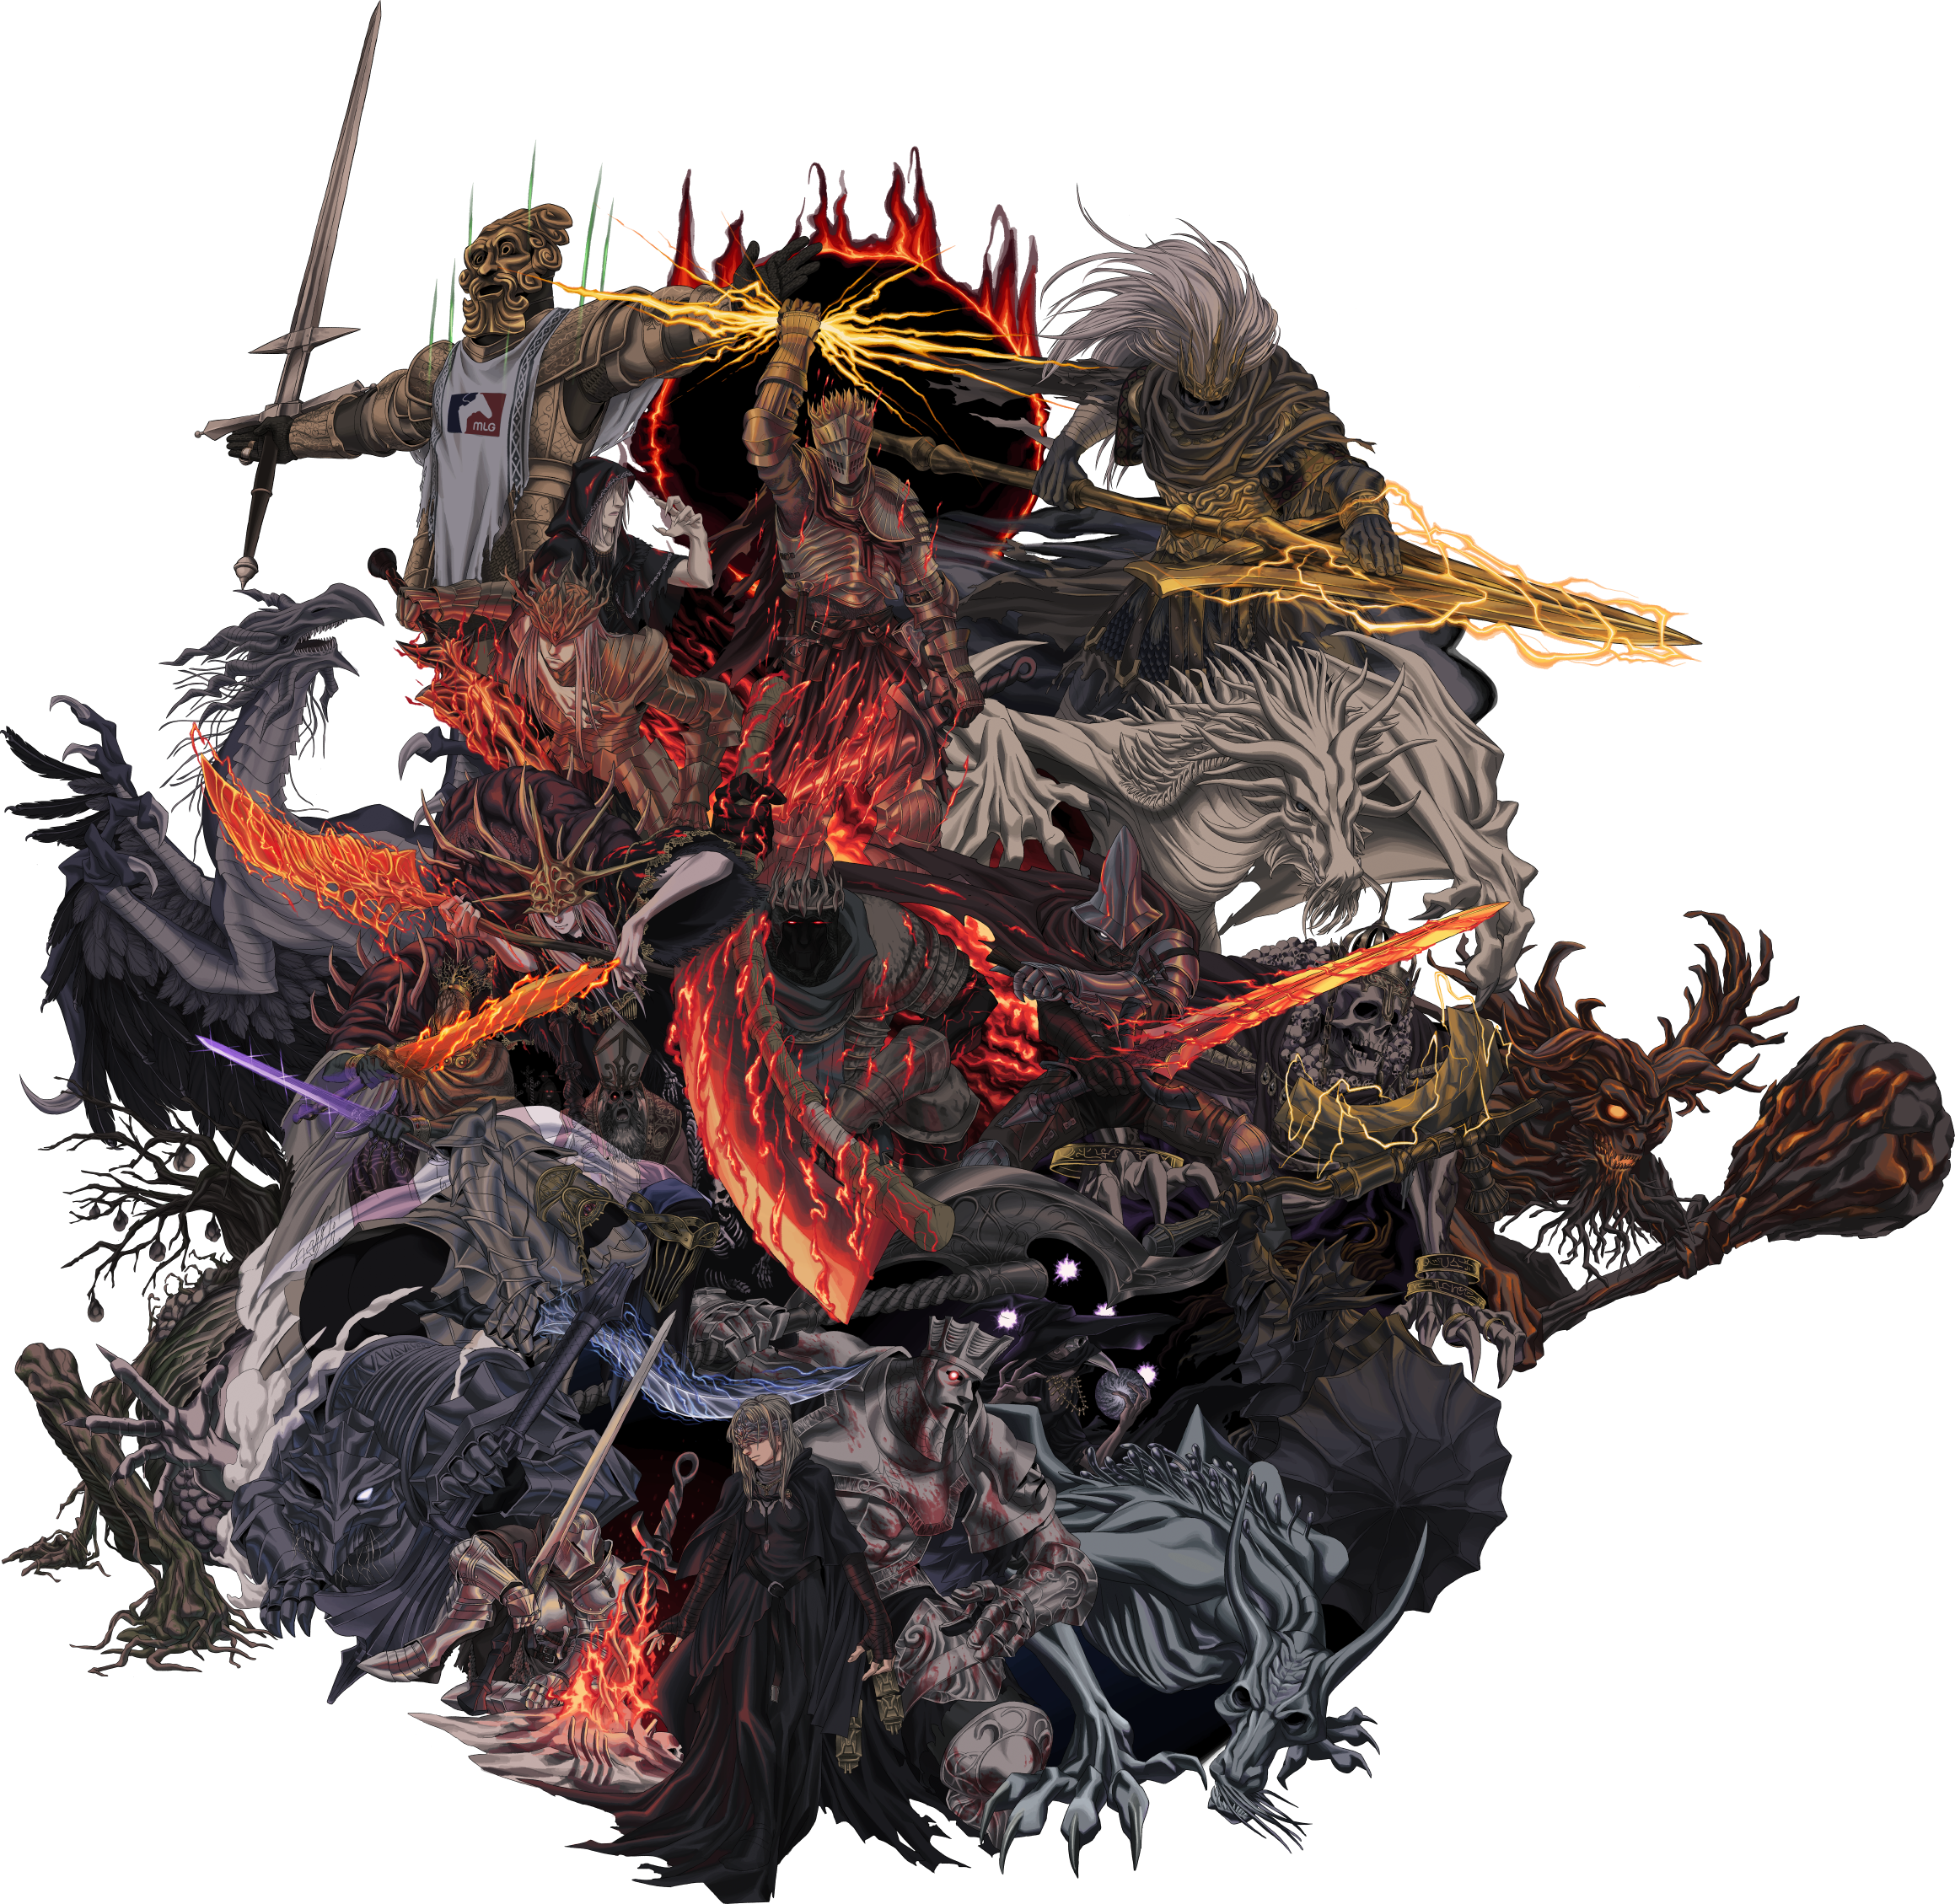 Dark Souls III by dragoninstall